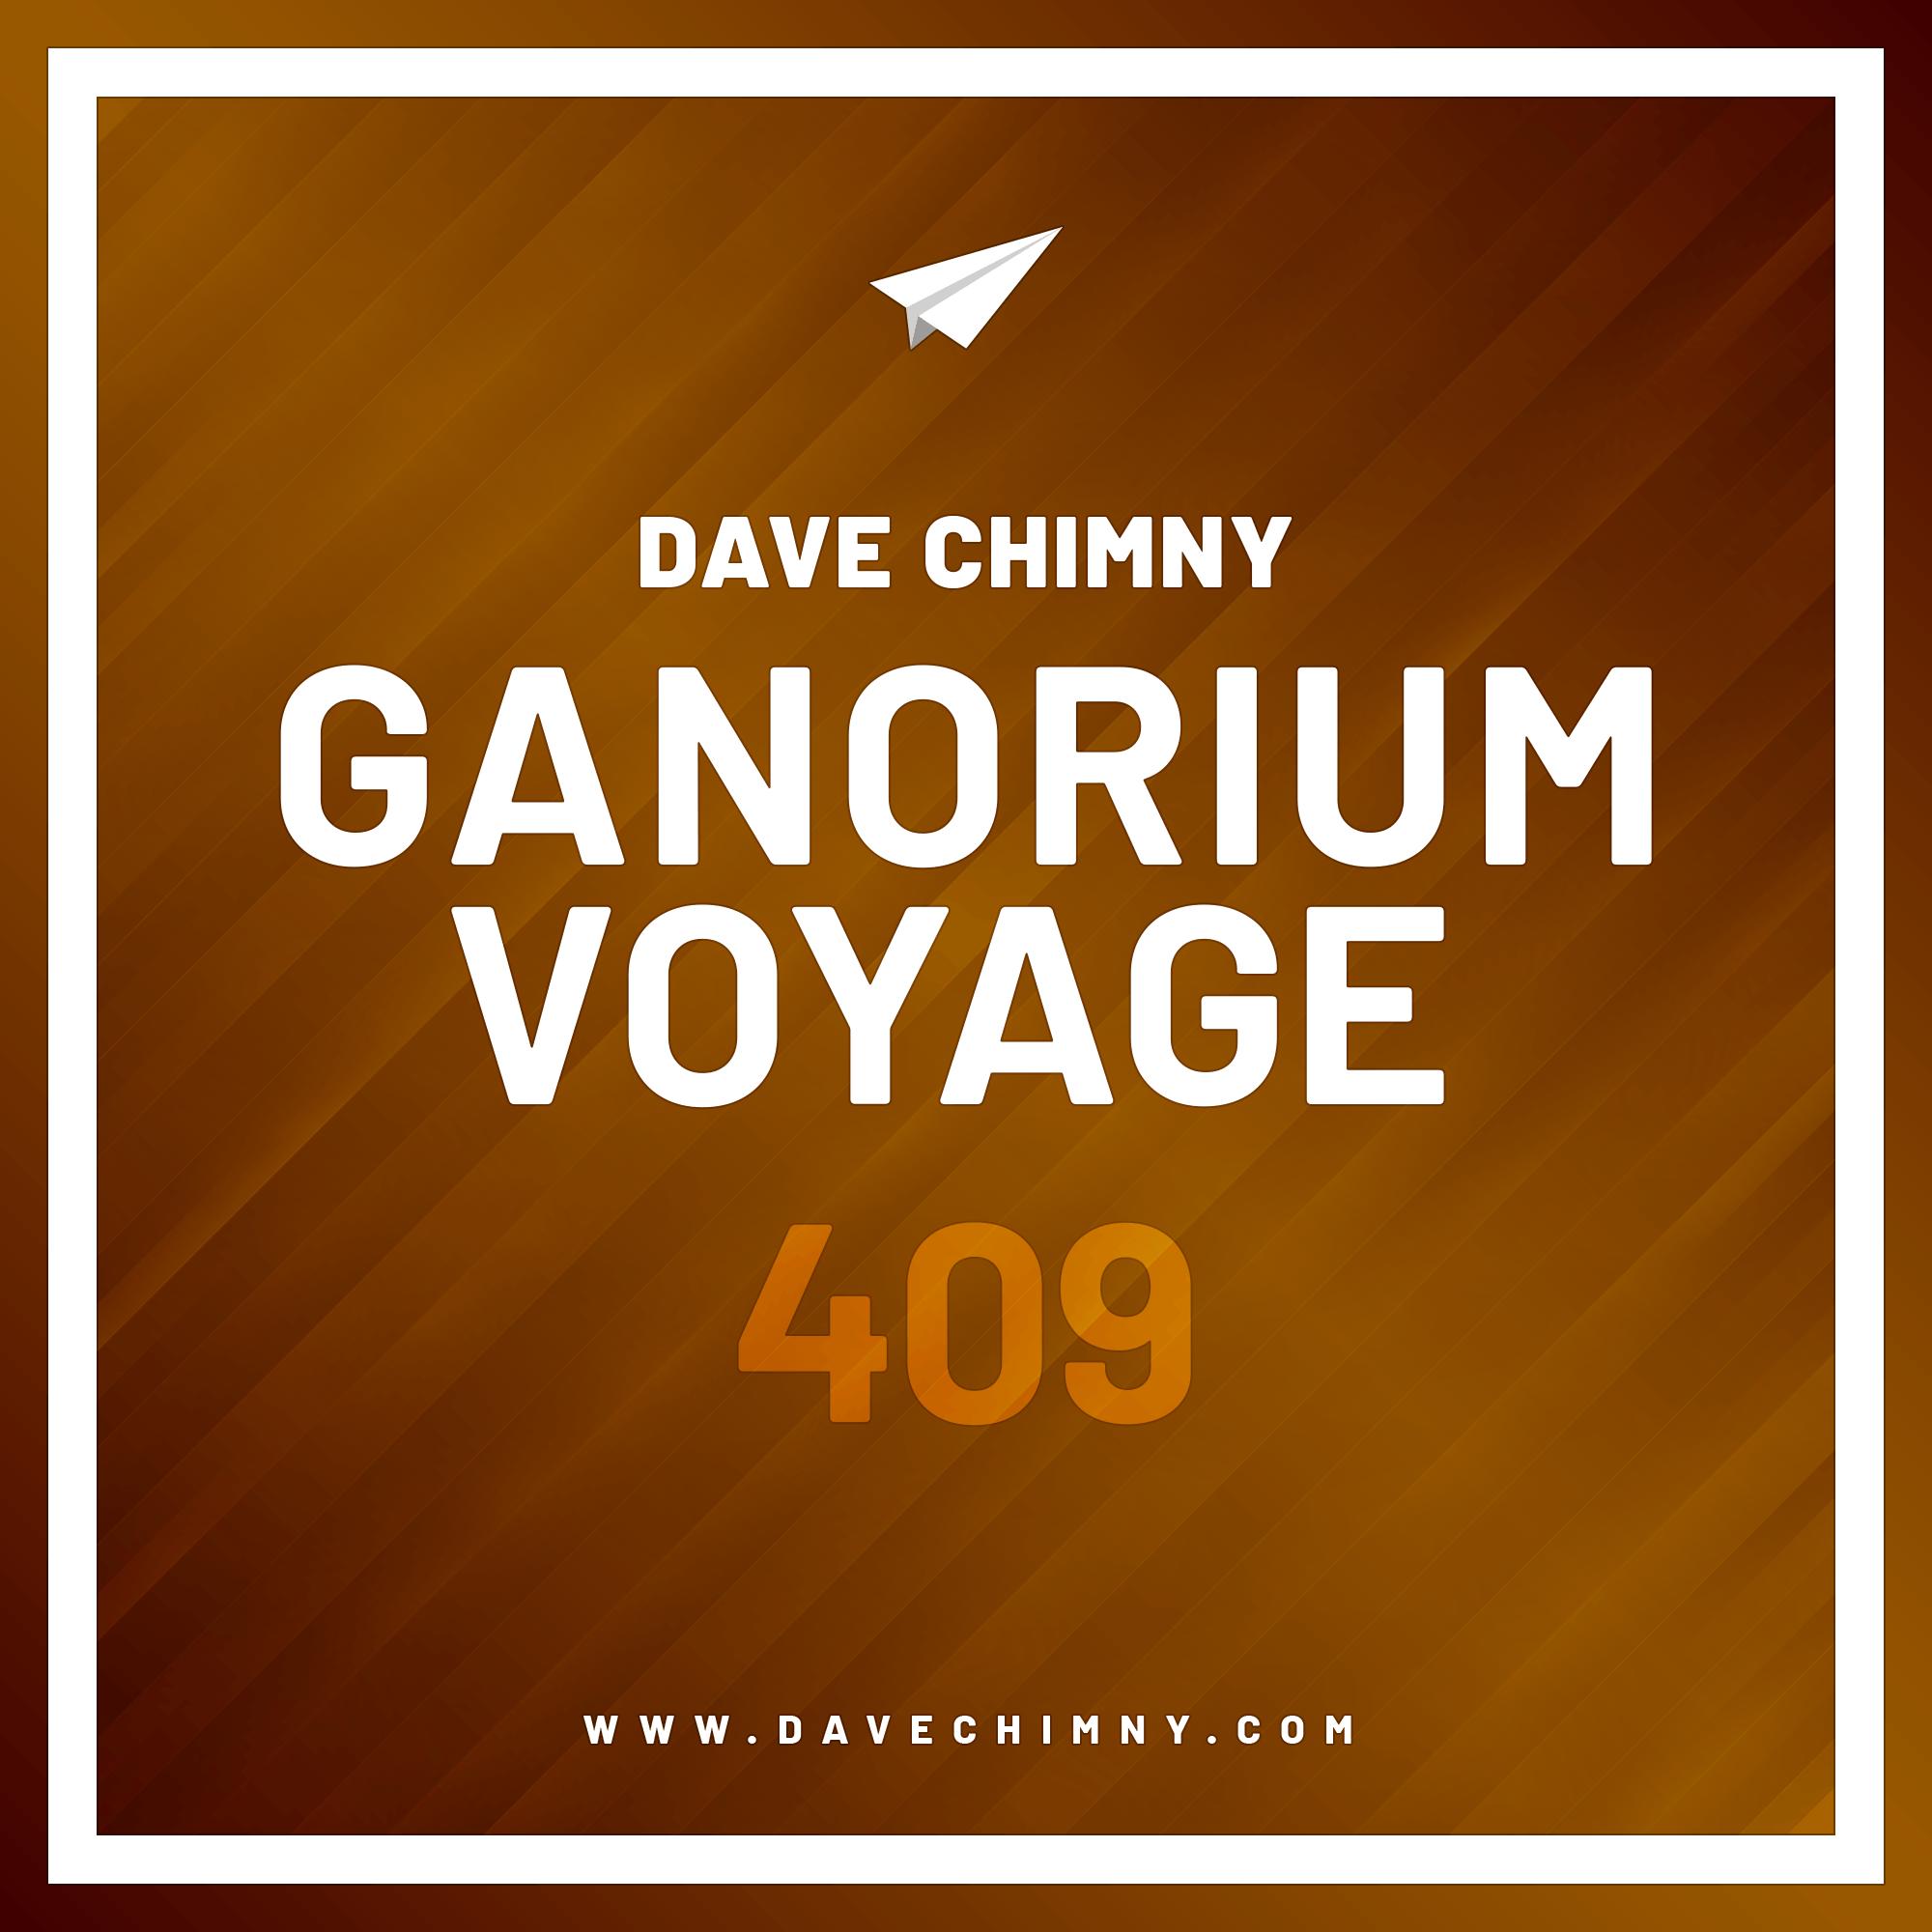 Dave Chimny – Ganorium Voyage 409